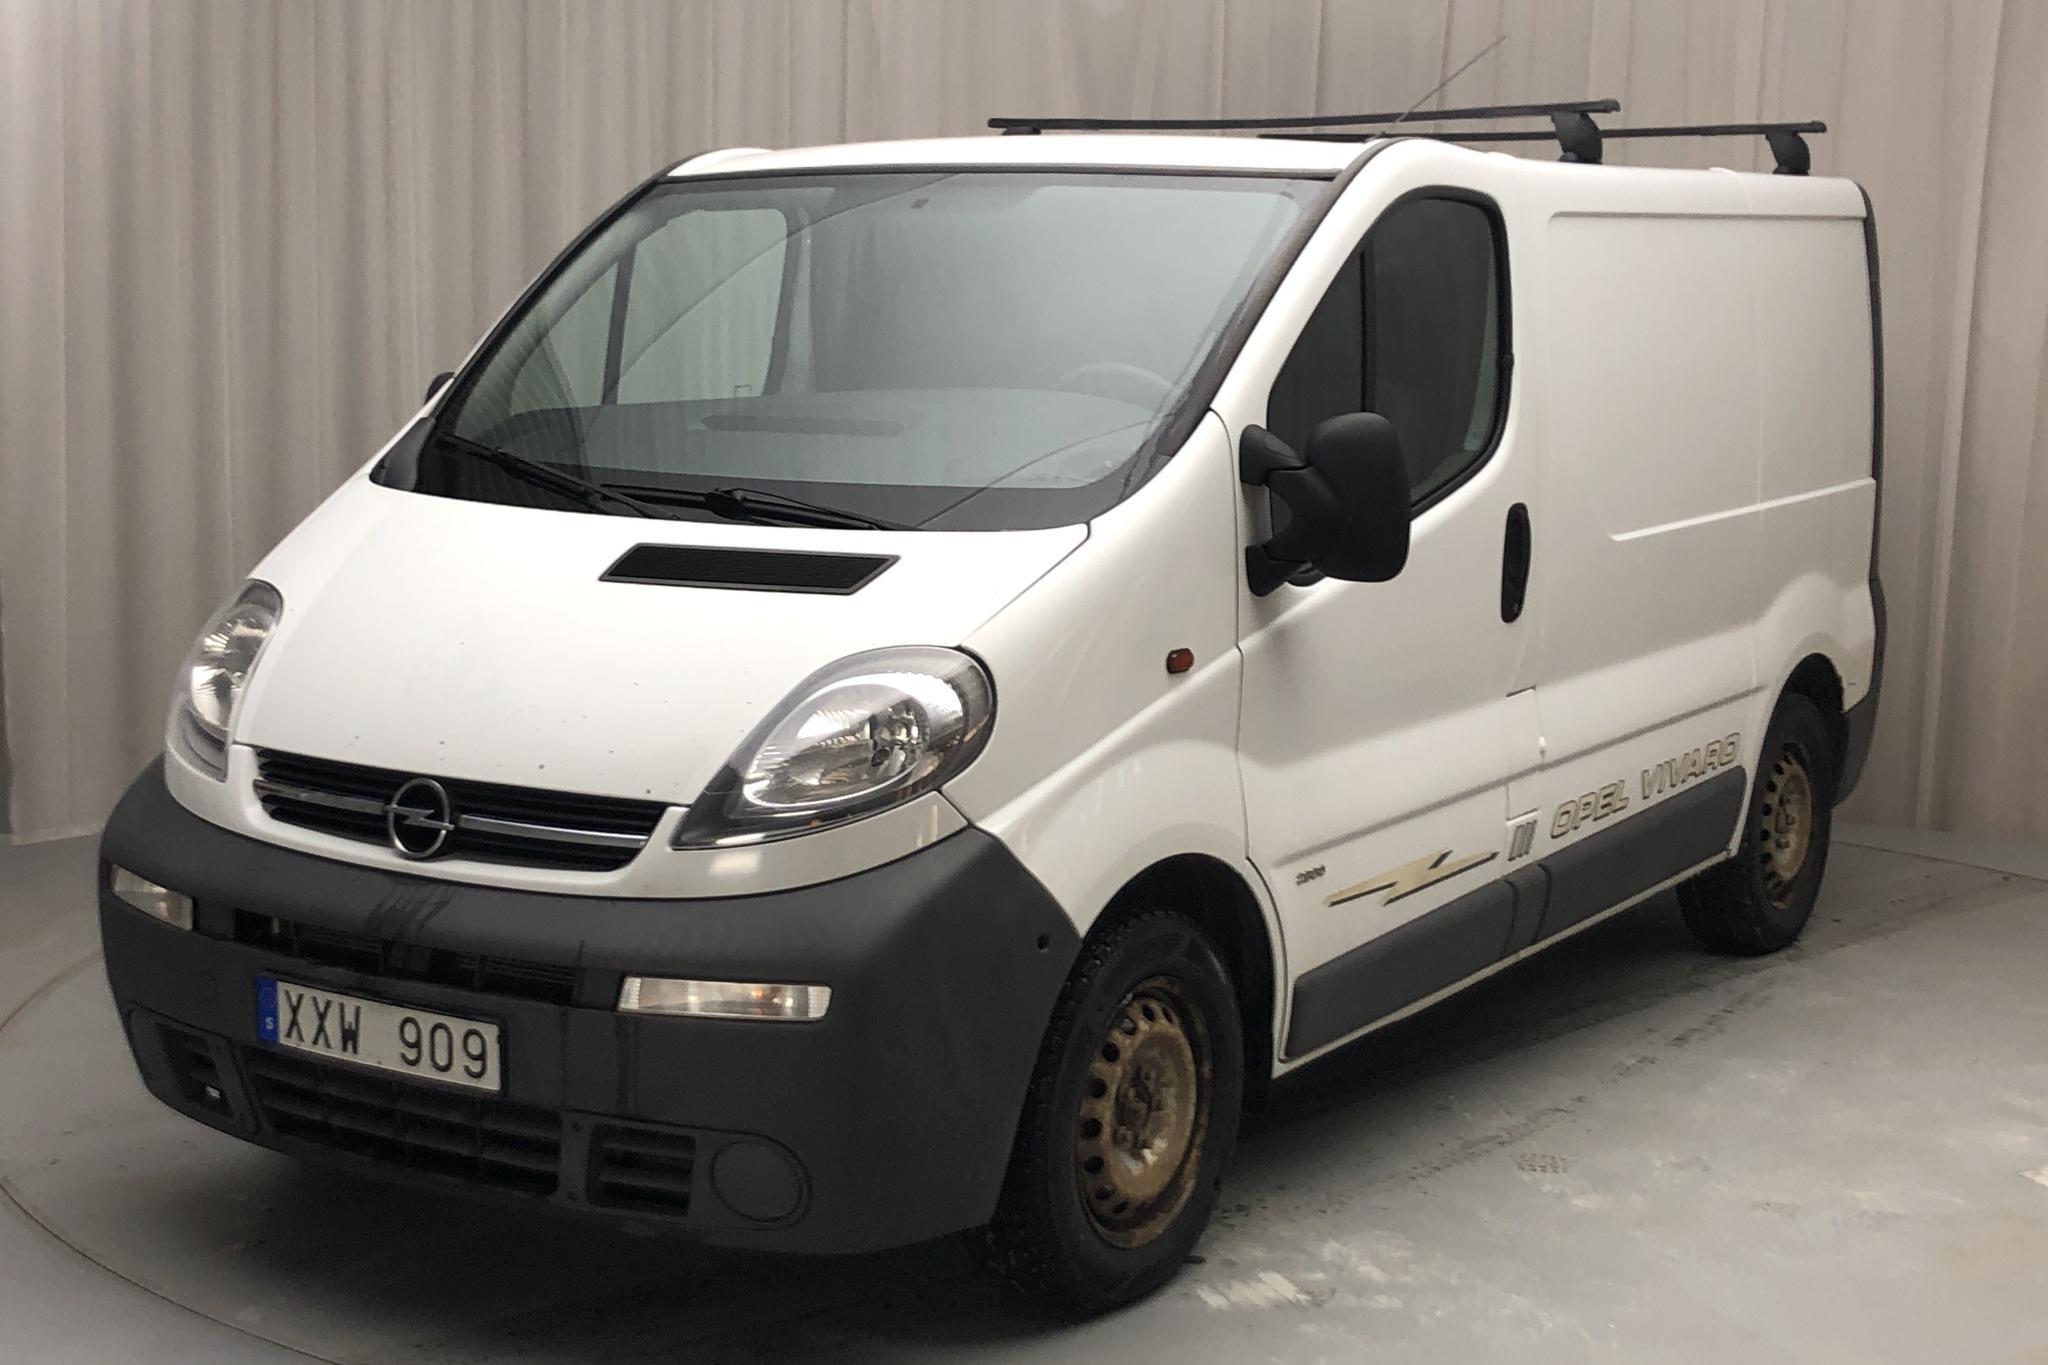 Opel Vivaro 2.5 CDTI (135hk) - 258 030 km - Manual - white - 2006